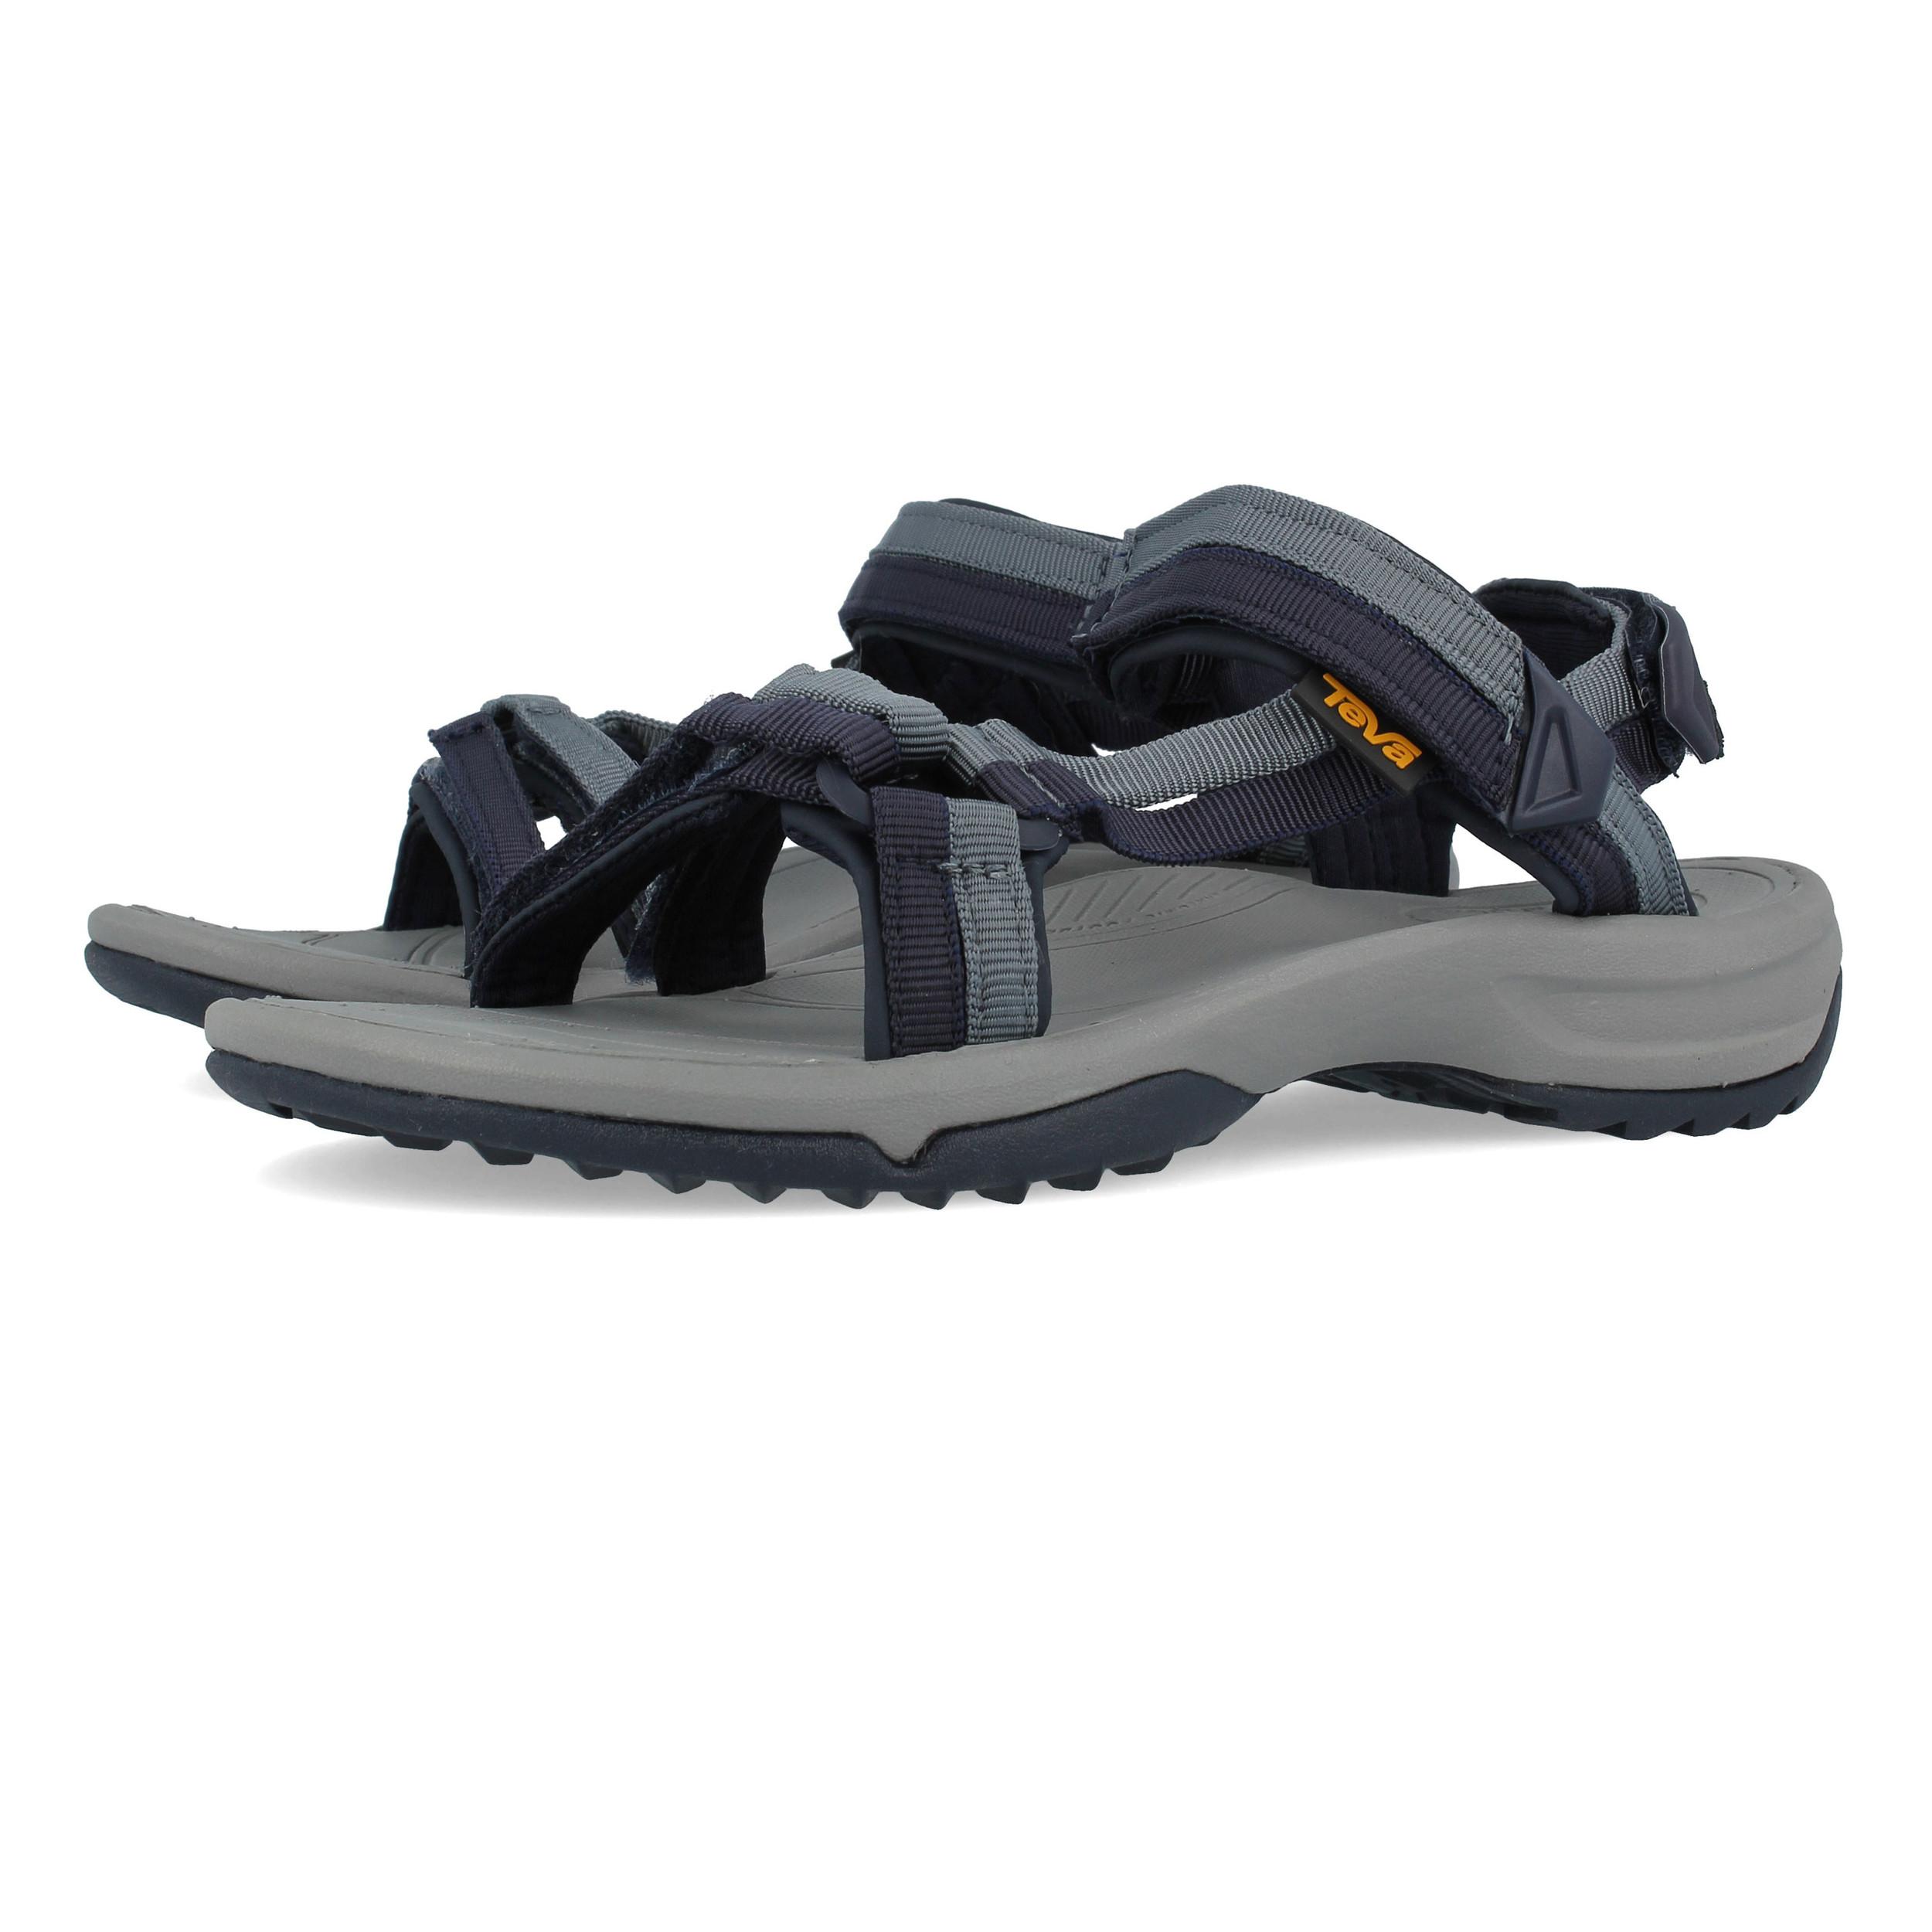 1adde7e838c1 Details about Teva Womens Terra FI Lite Walking Shoes Sandals Navy Blue  Sports Outdoors